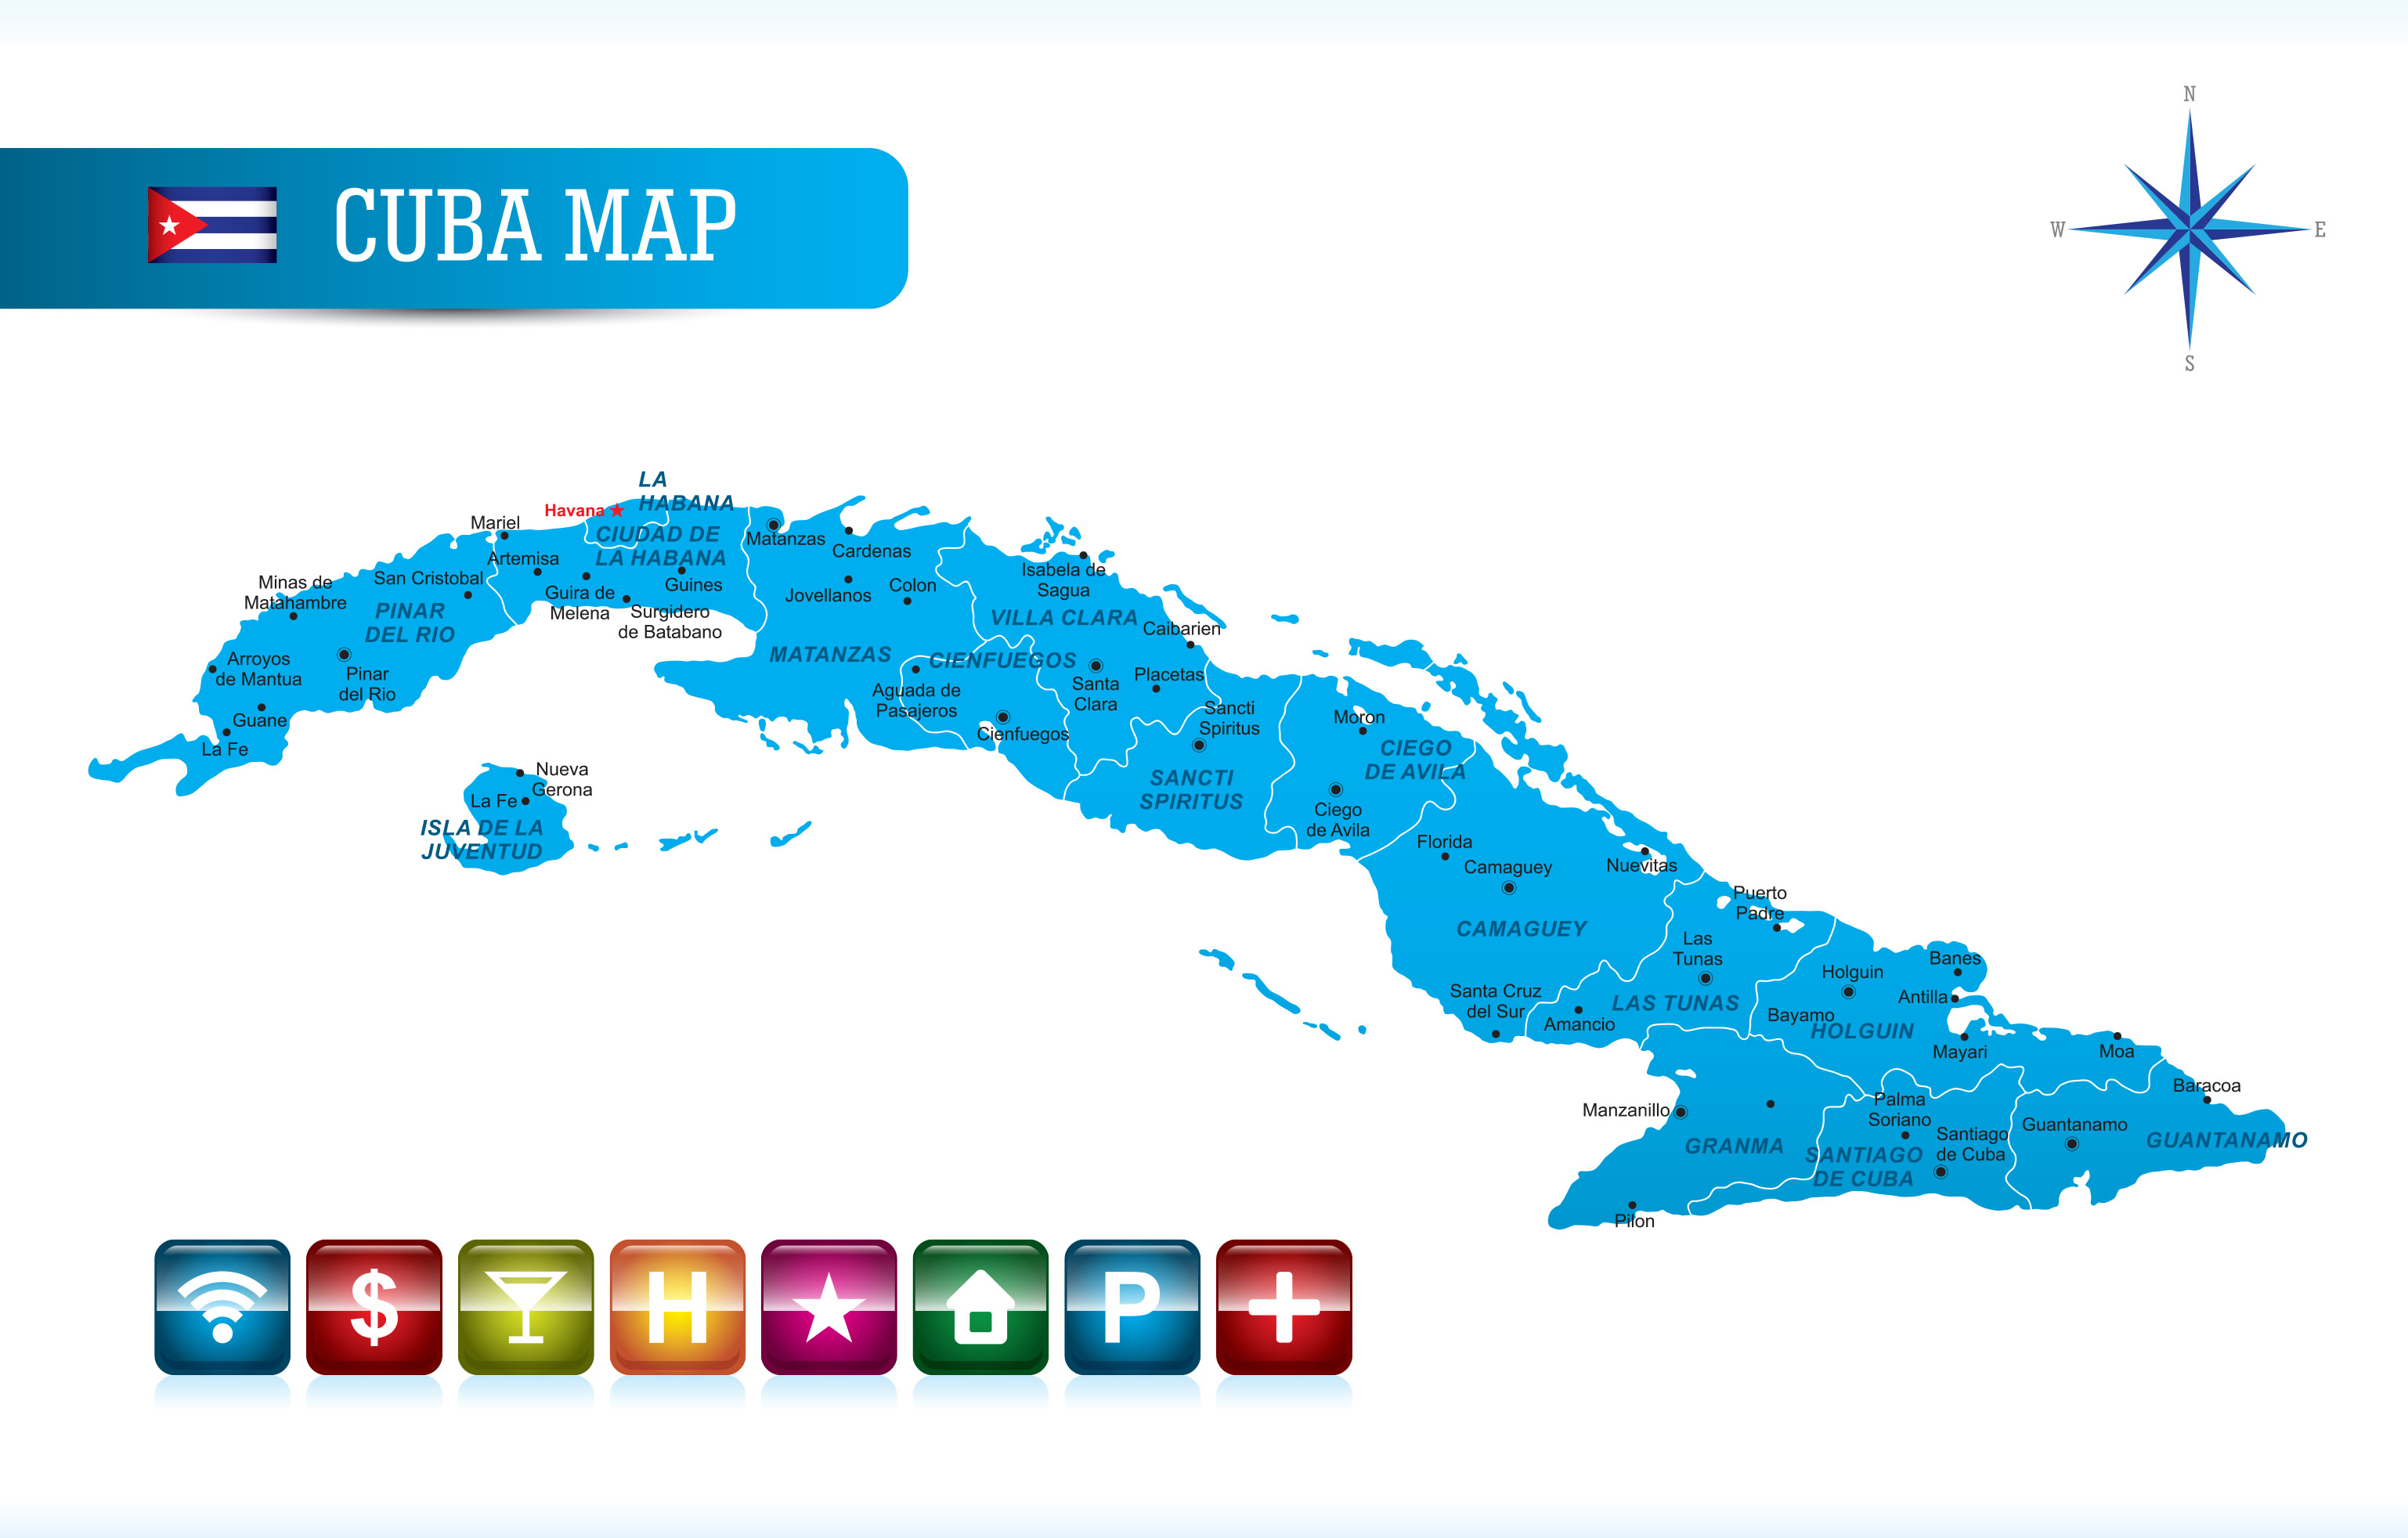 Cuba Map with Navigation